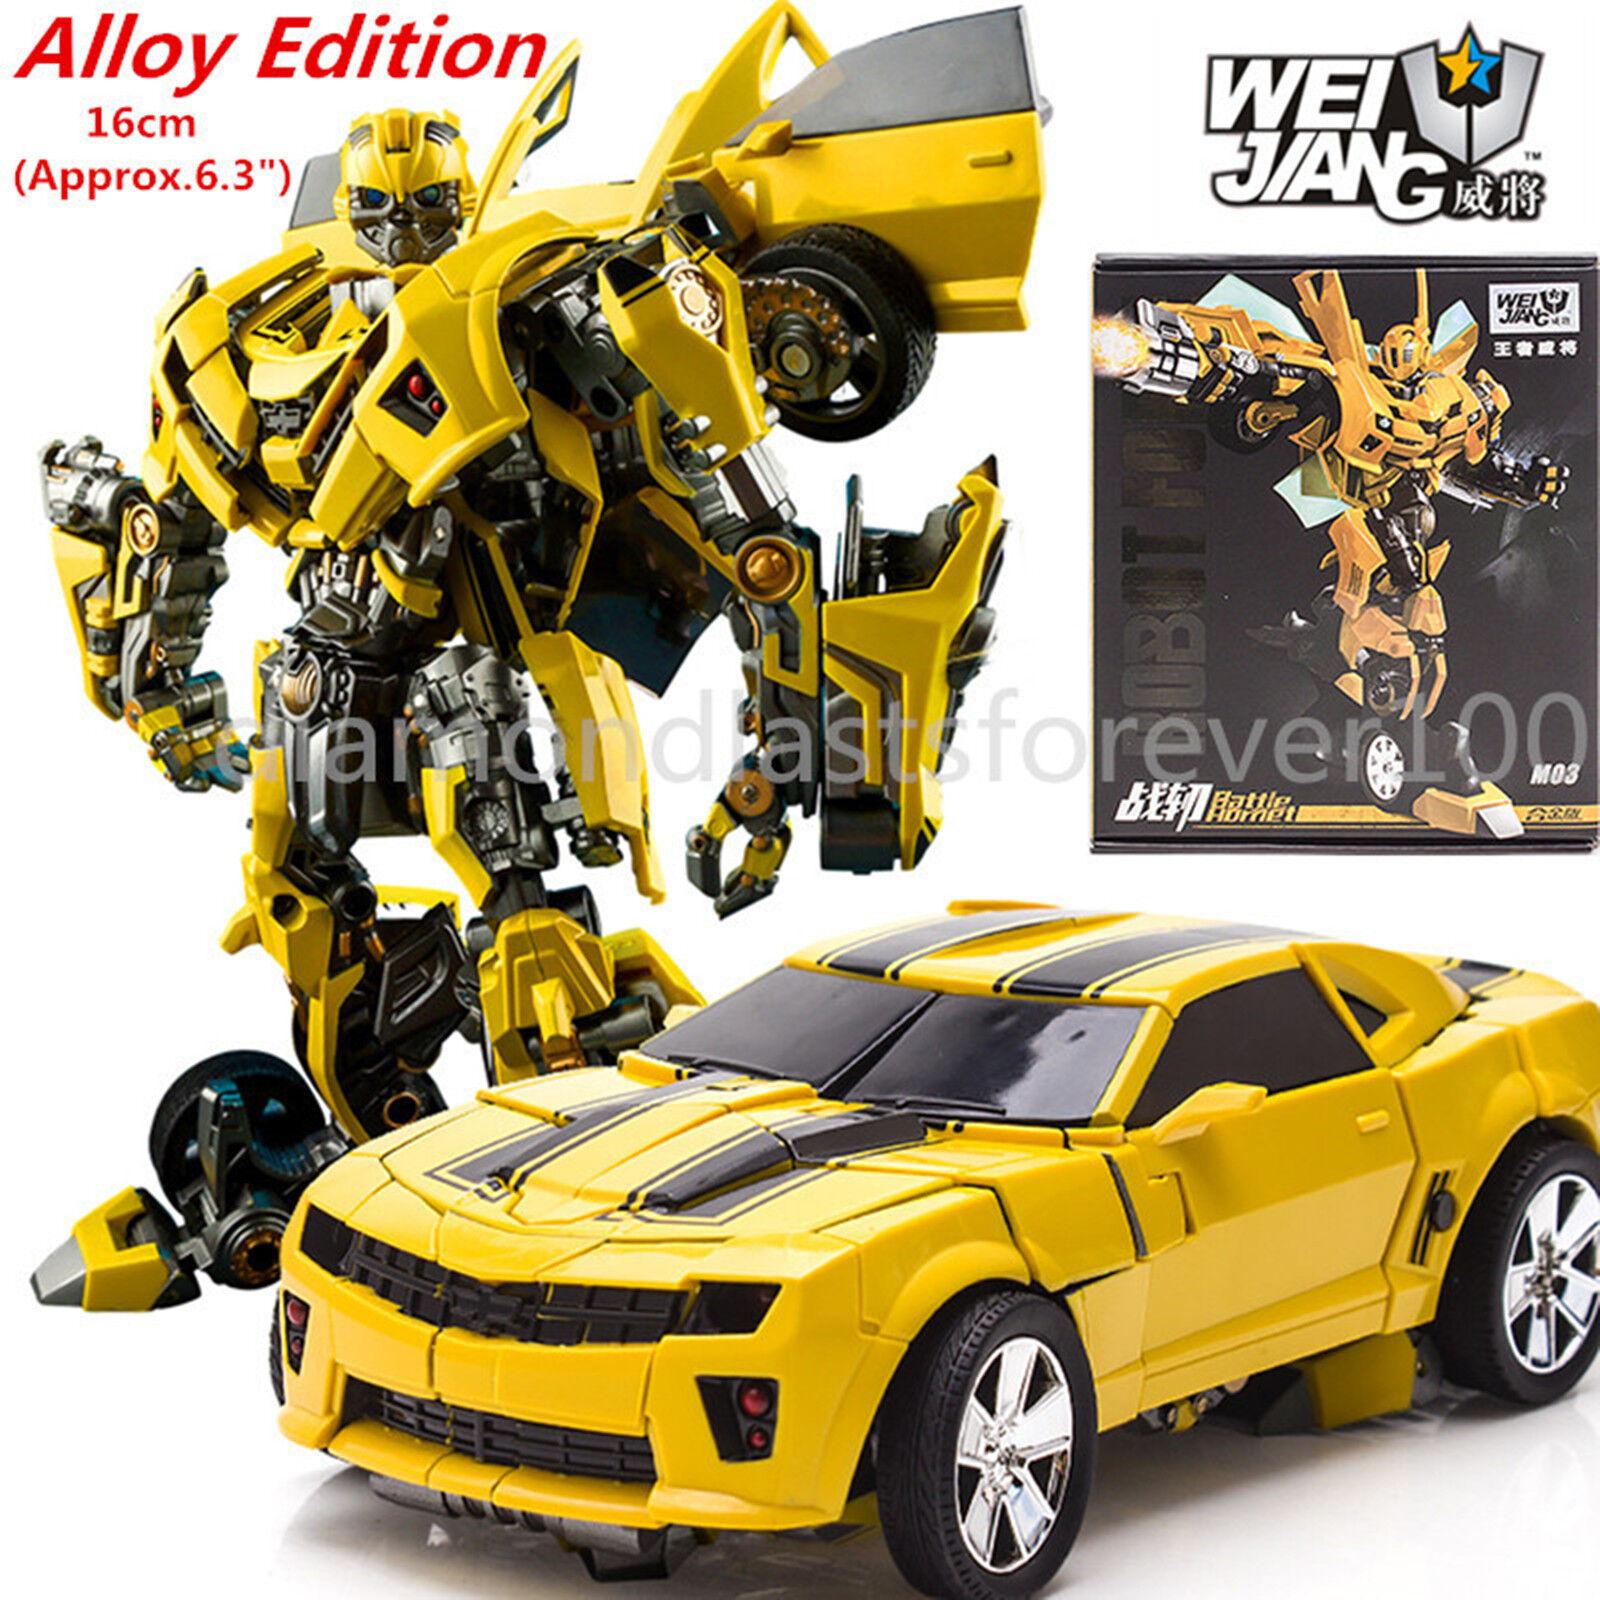 WeiJiang Action Figure Transformation Robot Force Battle Hornet Kids Toys Gifts